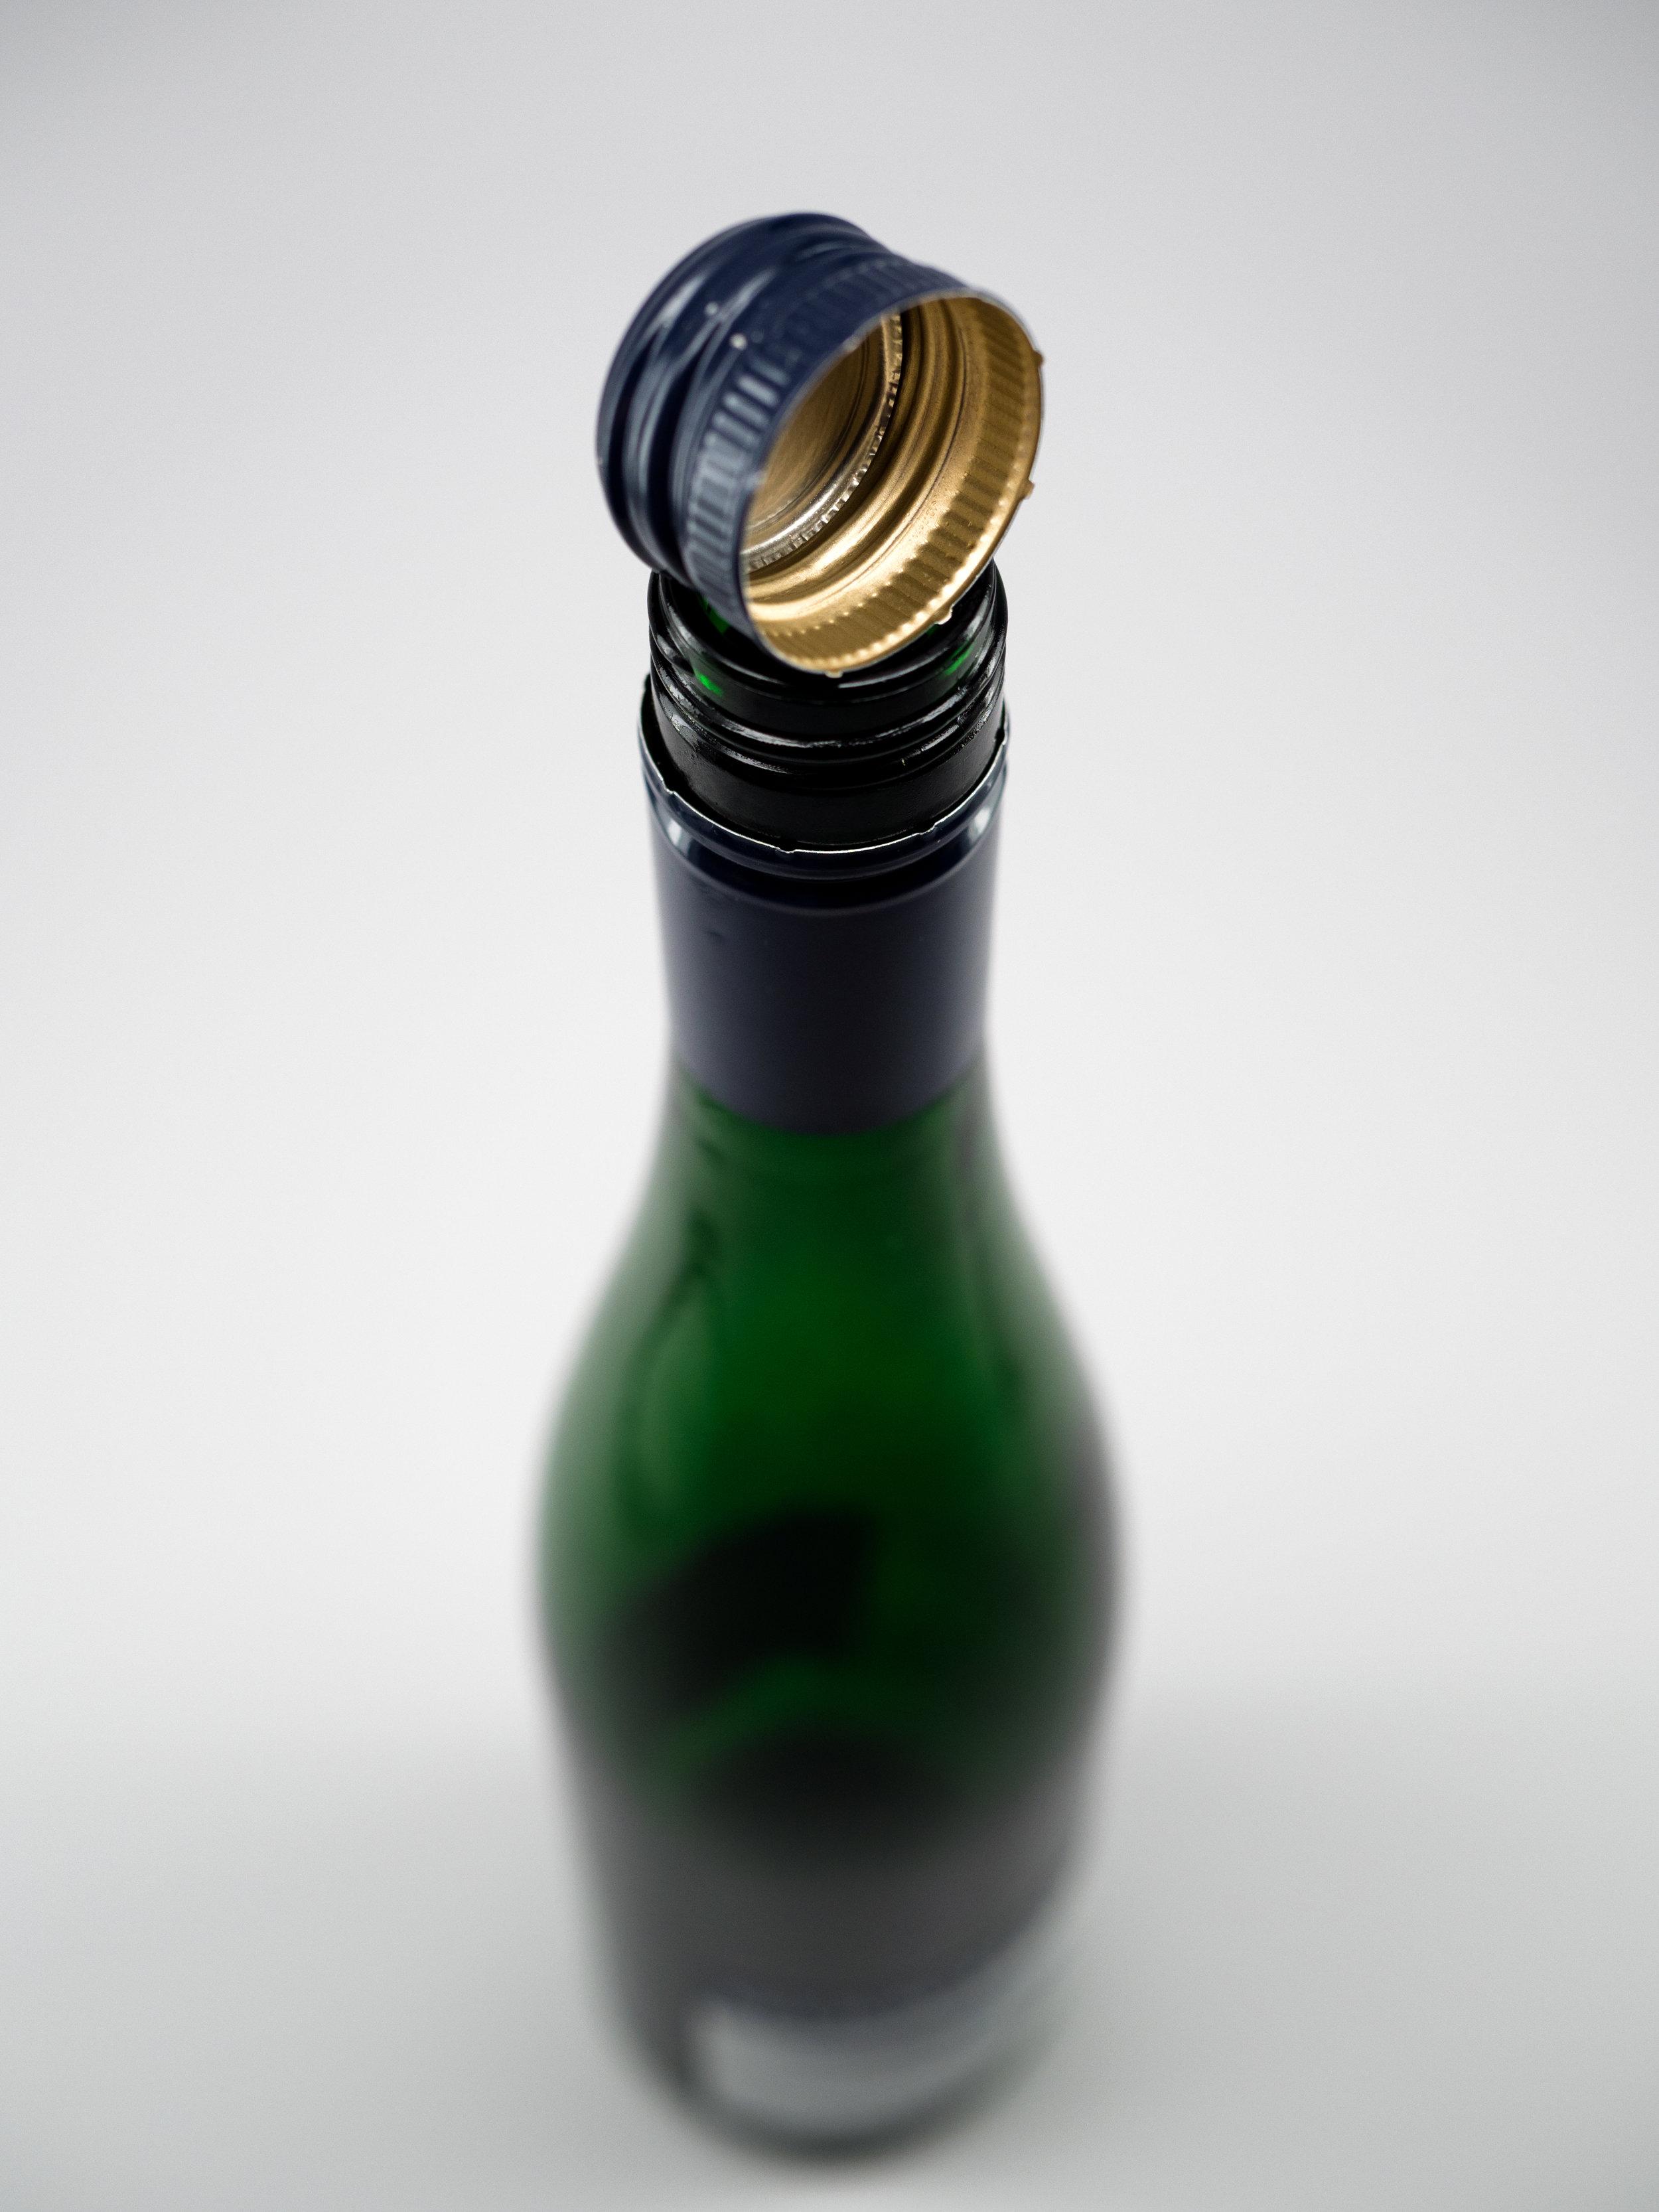 Musings by the Glass - Cork vs Screw Cap - Screw Cap and Bottle